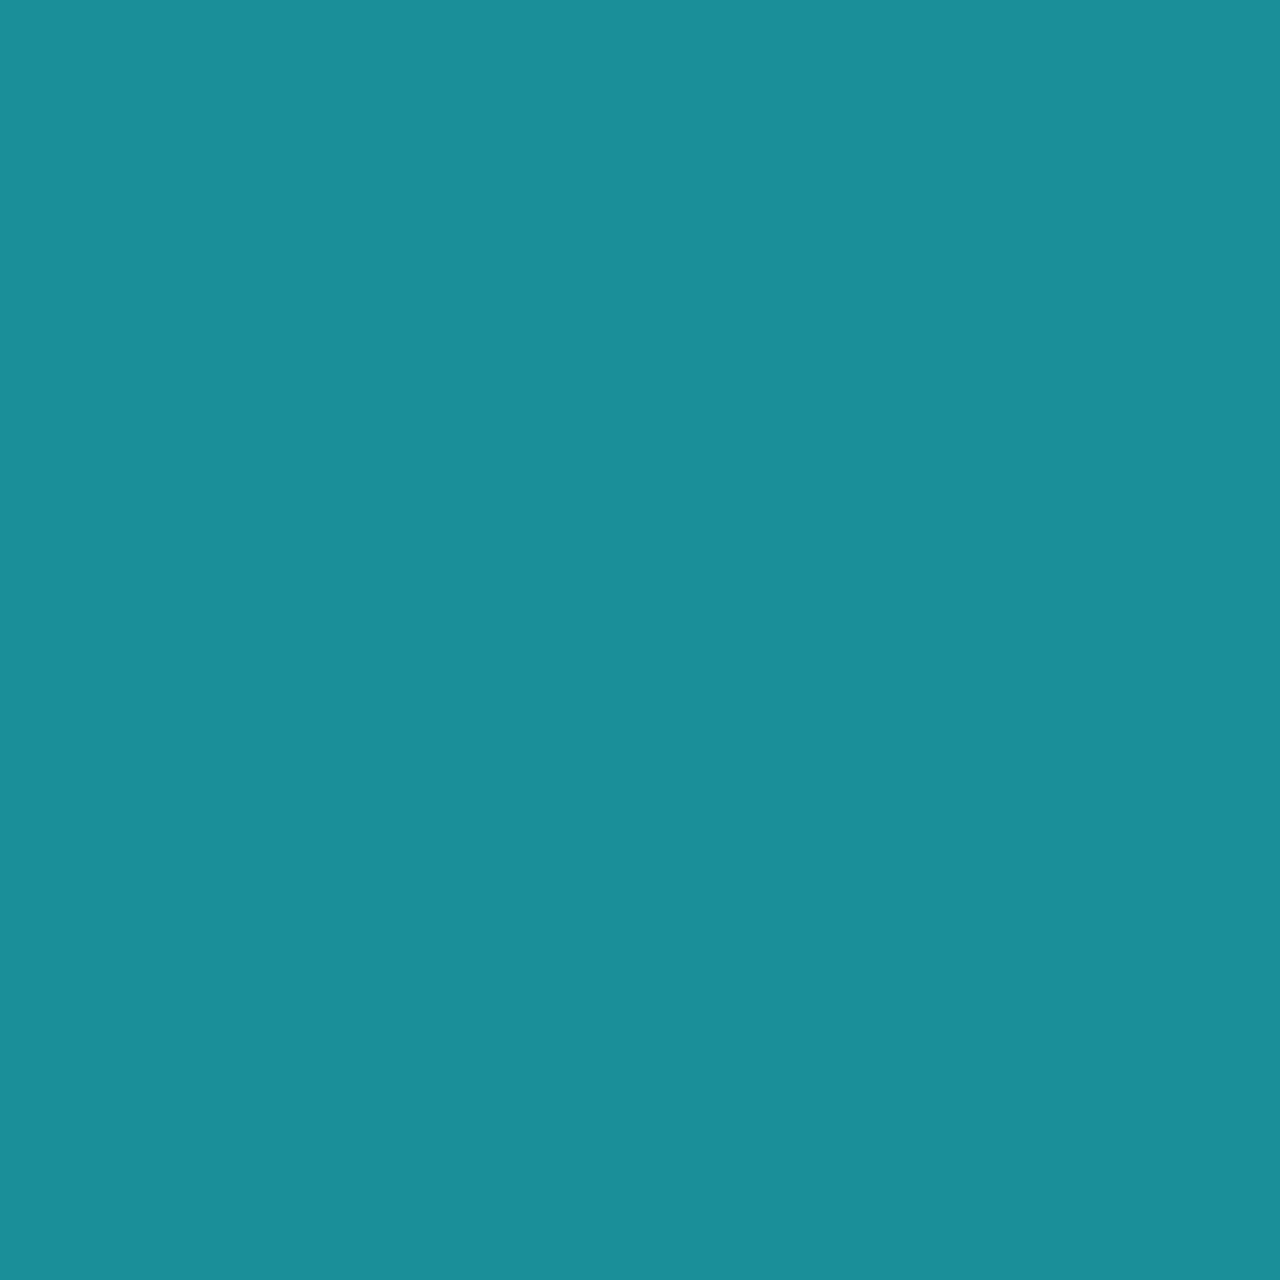 Oracal 651 Adhesive Vinyl Turquoise Blue 066 12 Quot X 10